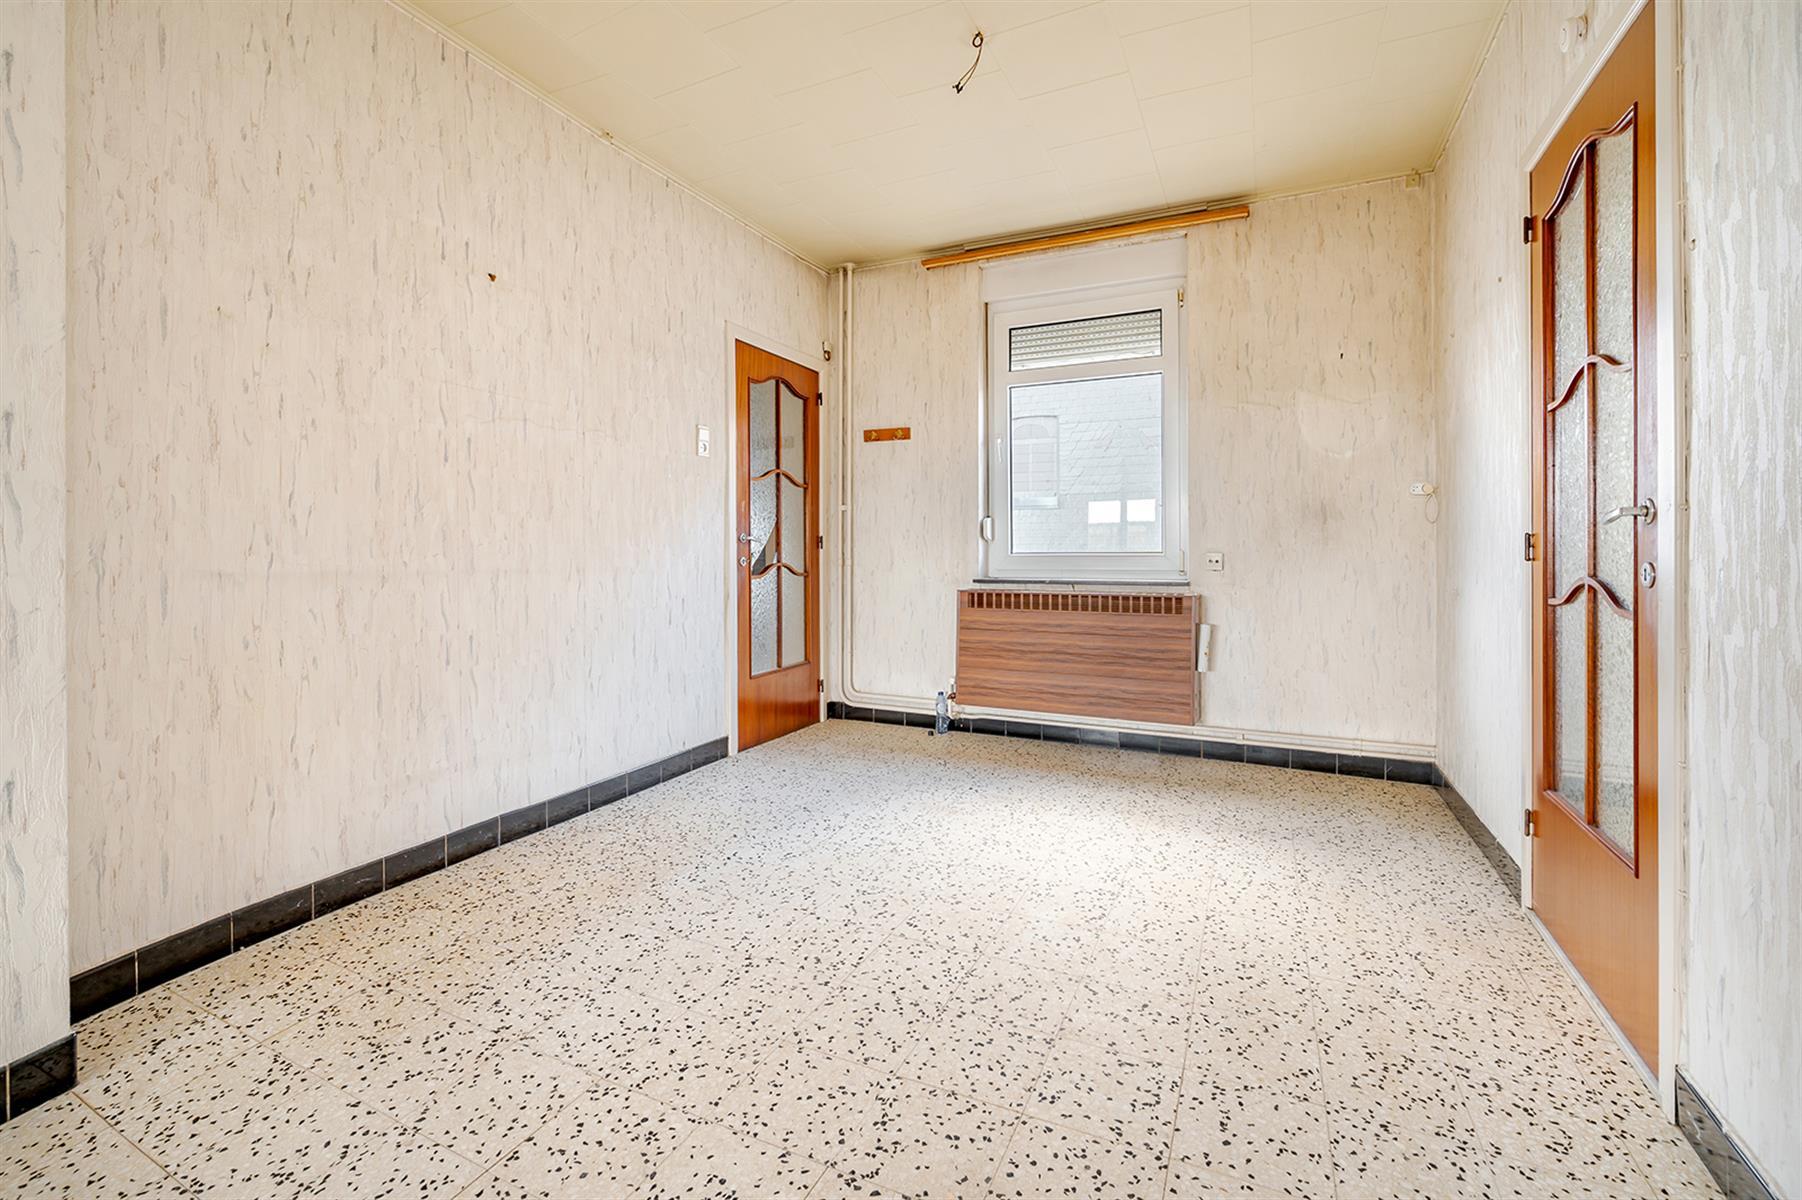 Maison - Remicourt - #4293207-2